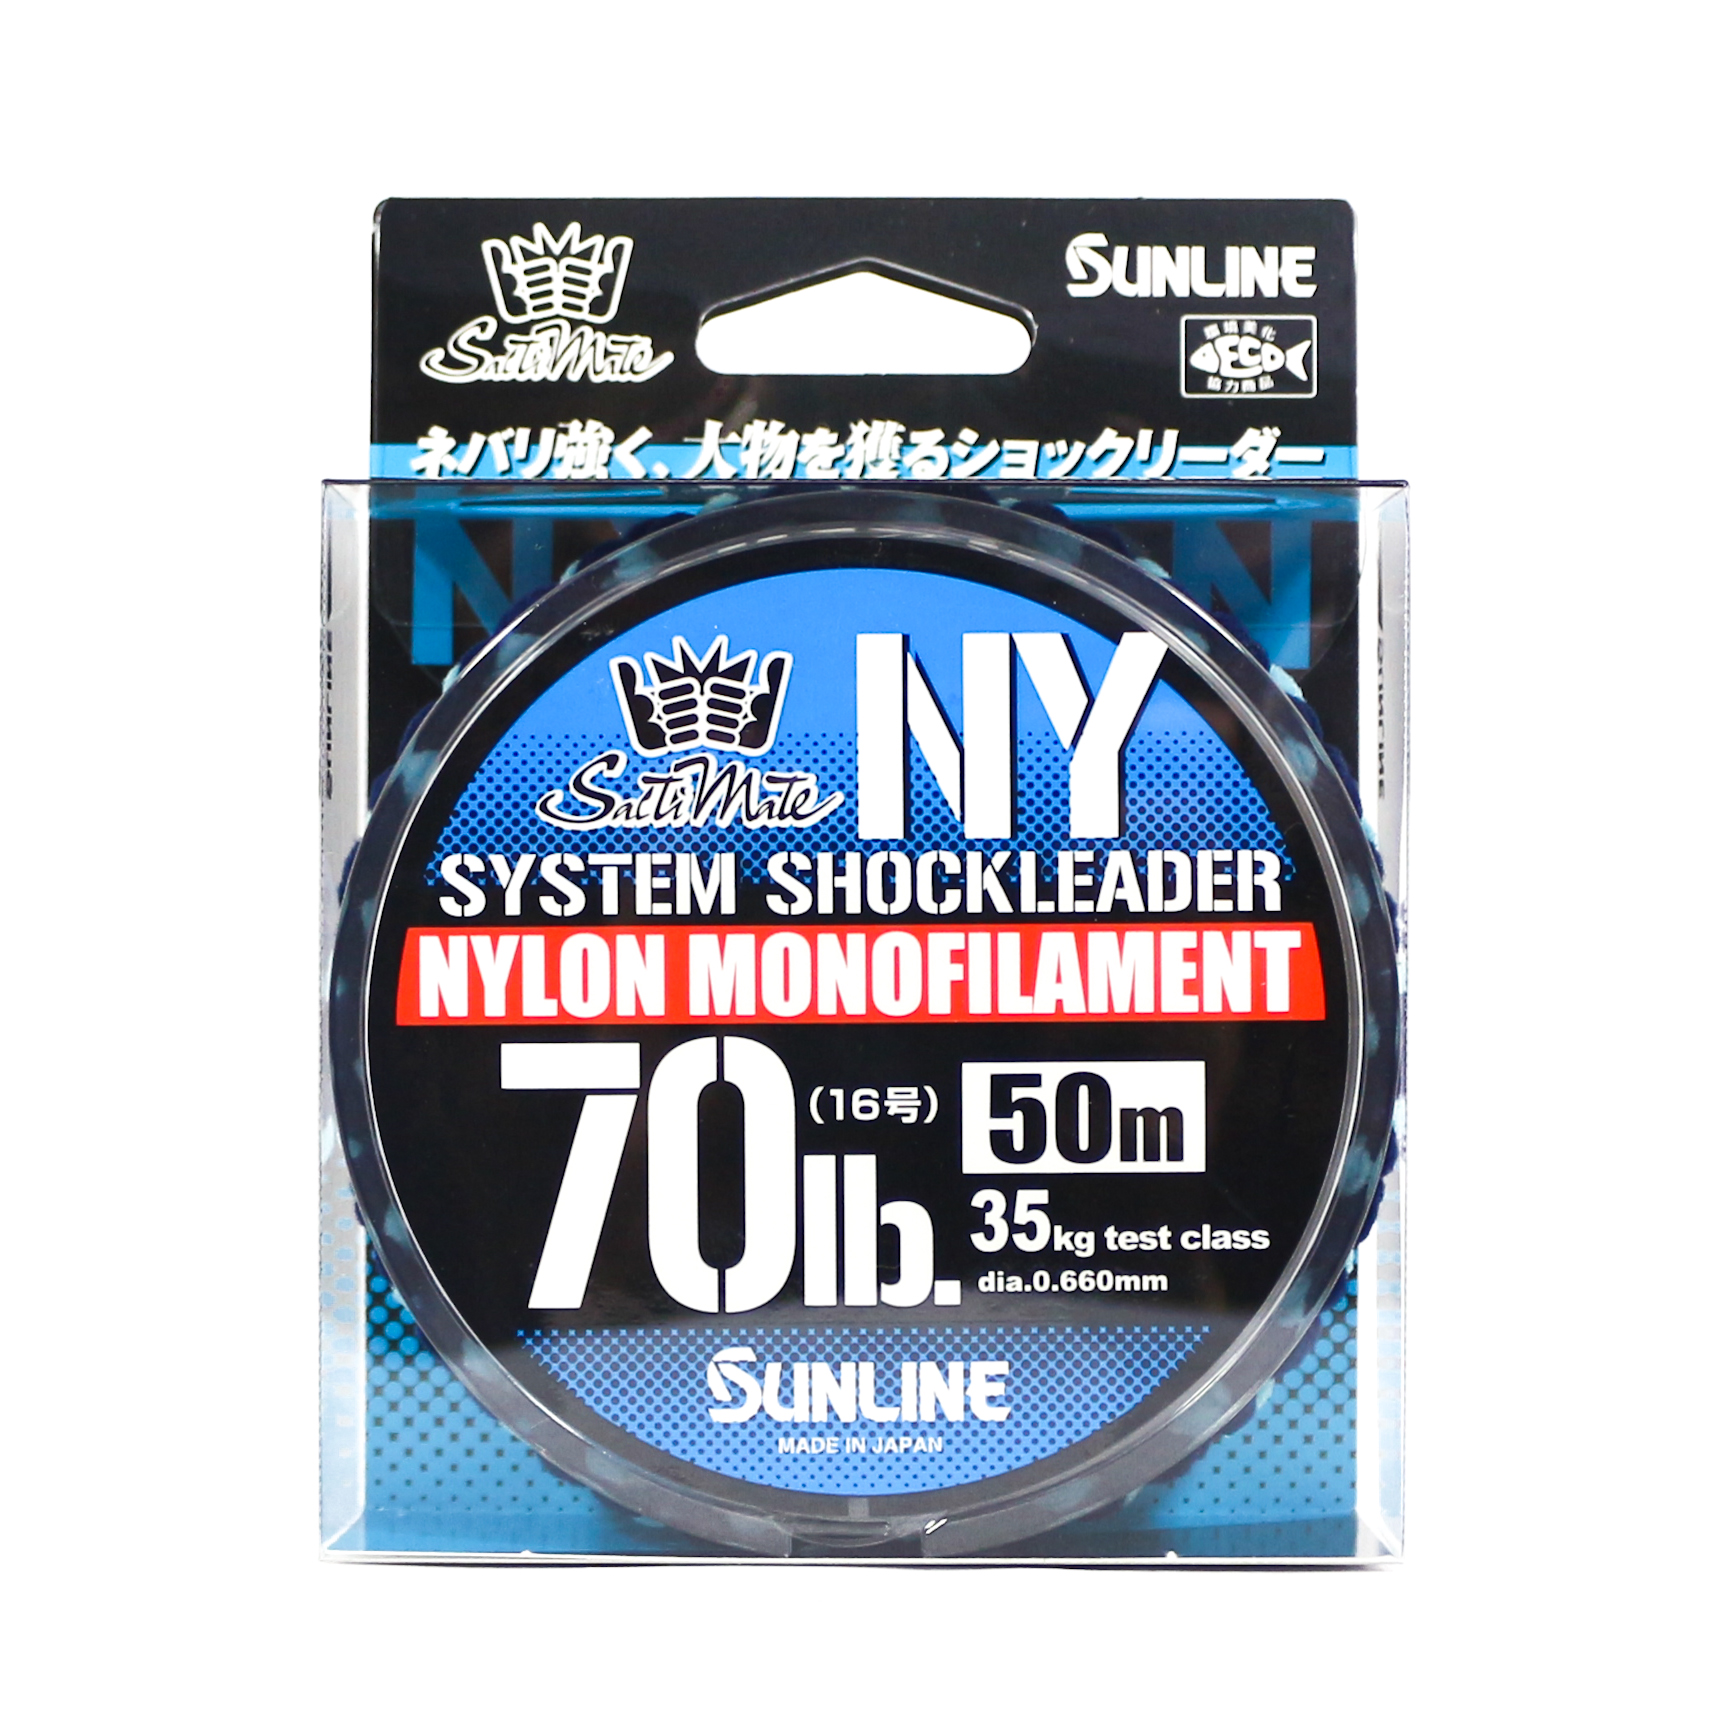 Sunline NY System Shock Leader Nylon 50m 70lb (9352)